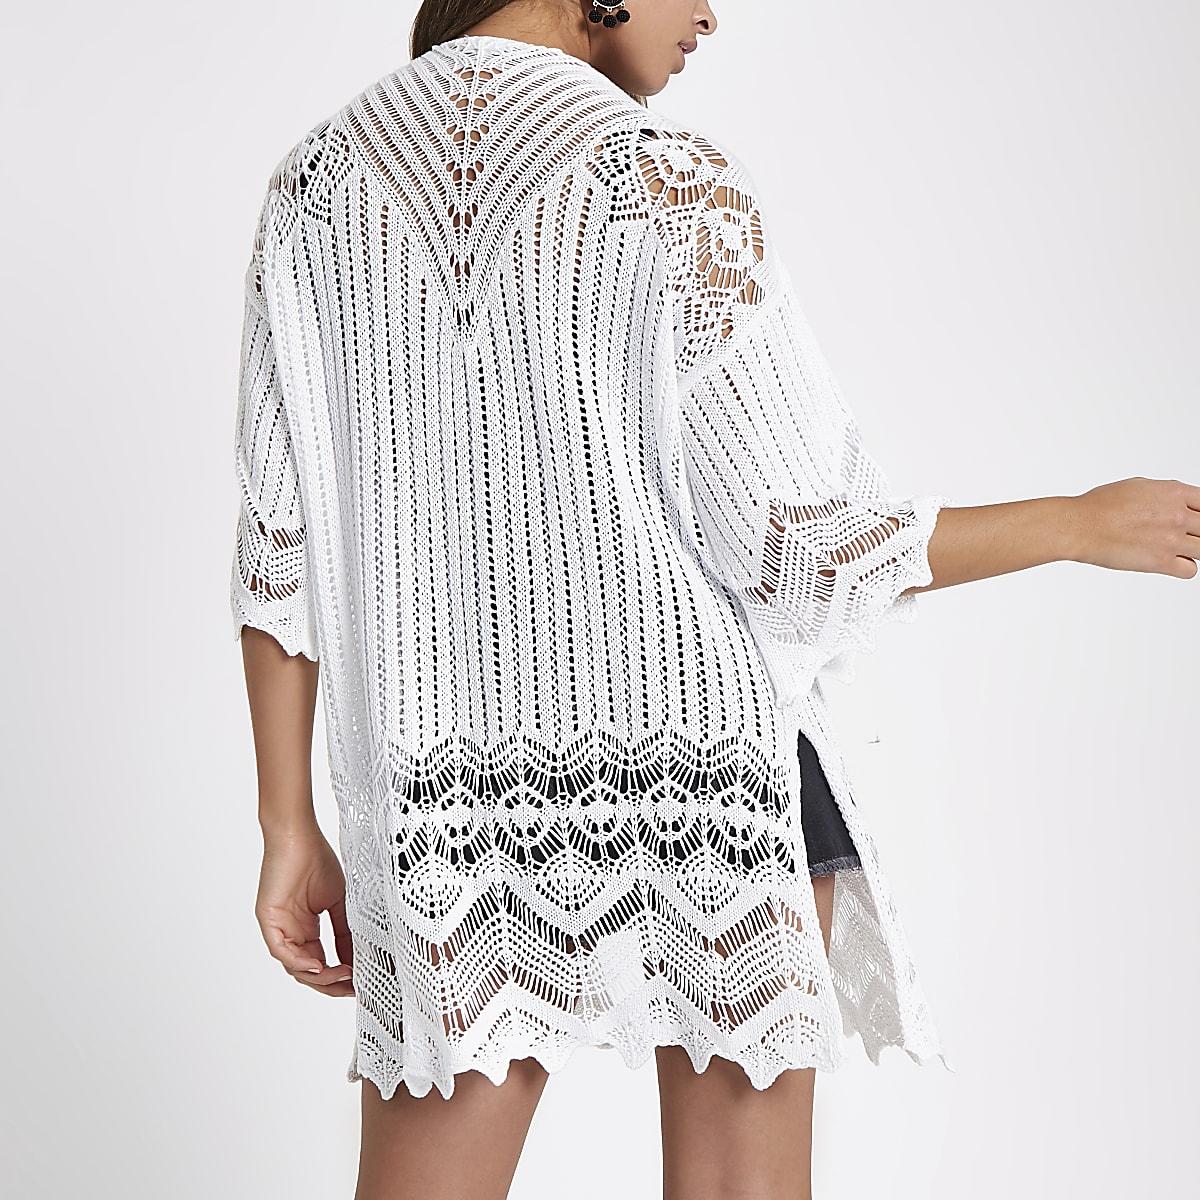 White Crochet Knit Kimono Sleeve Cardigan Kimonos Tops Women